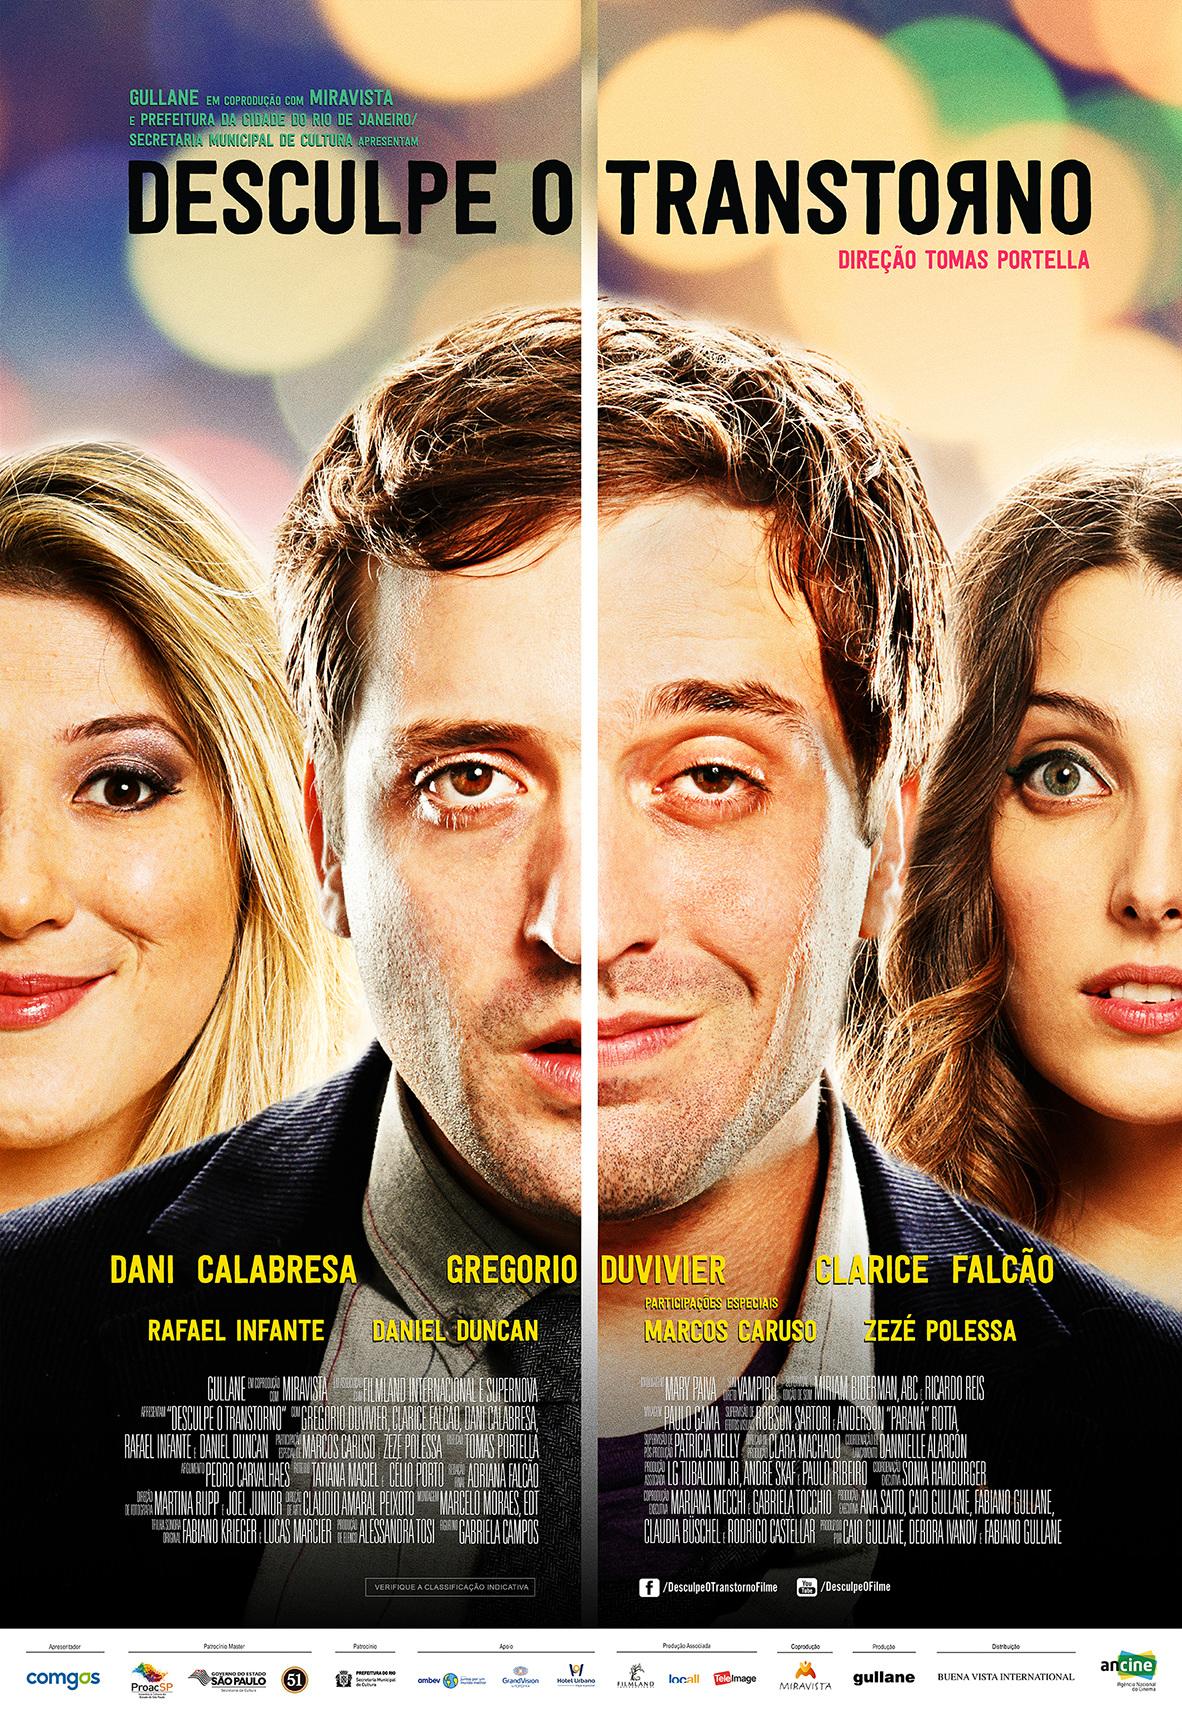 Desculpe o Transtorno - Filme 2015 - AdoroCinema